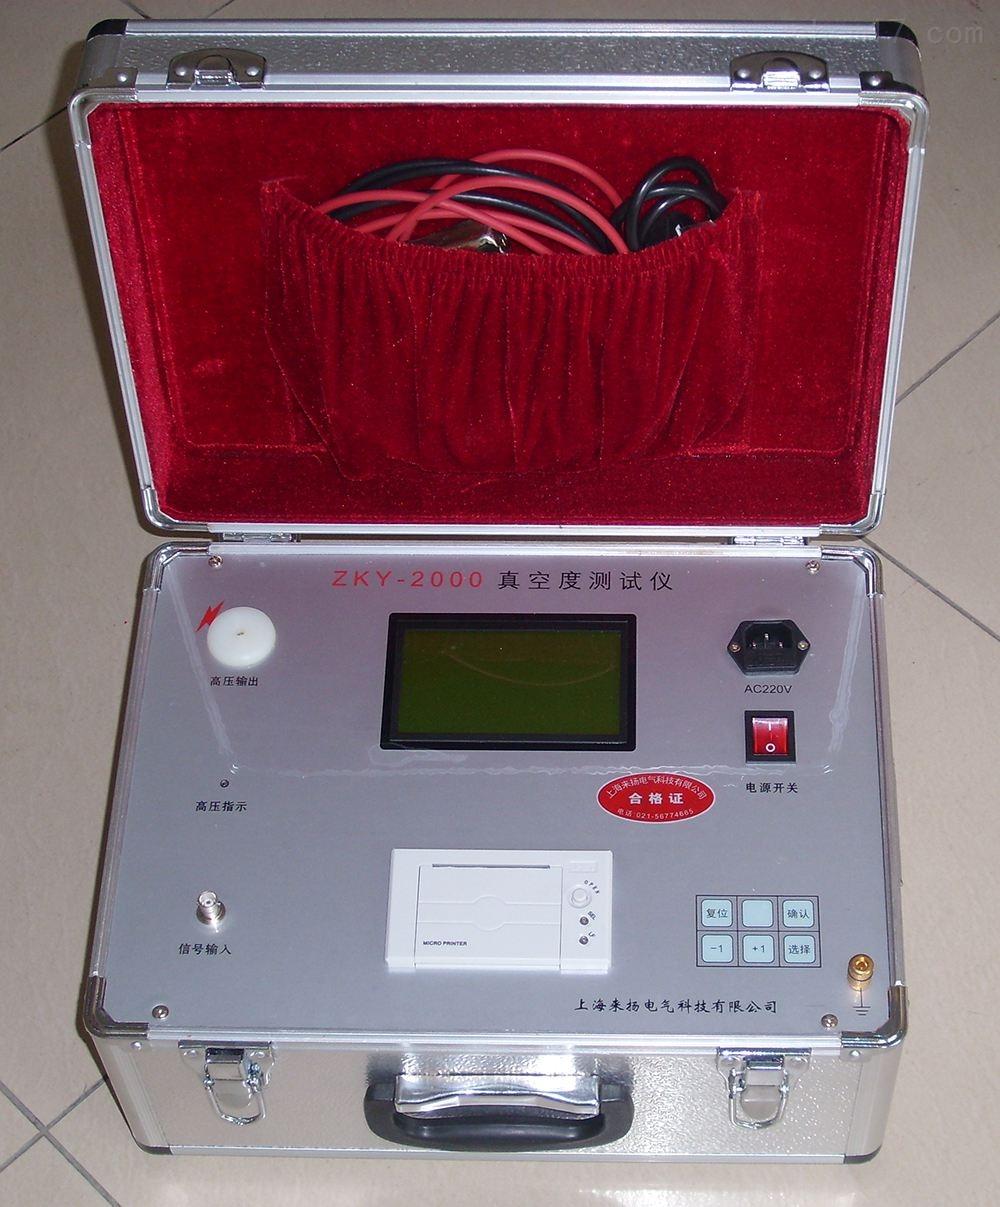 zky-2000高压断路器真控值测试仪